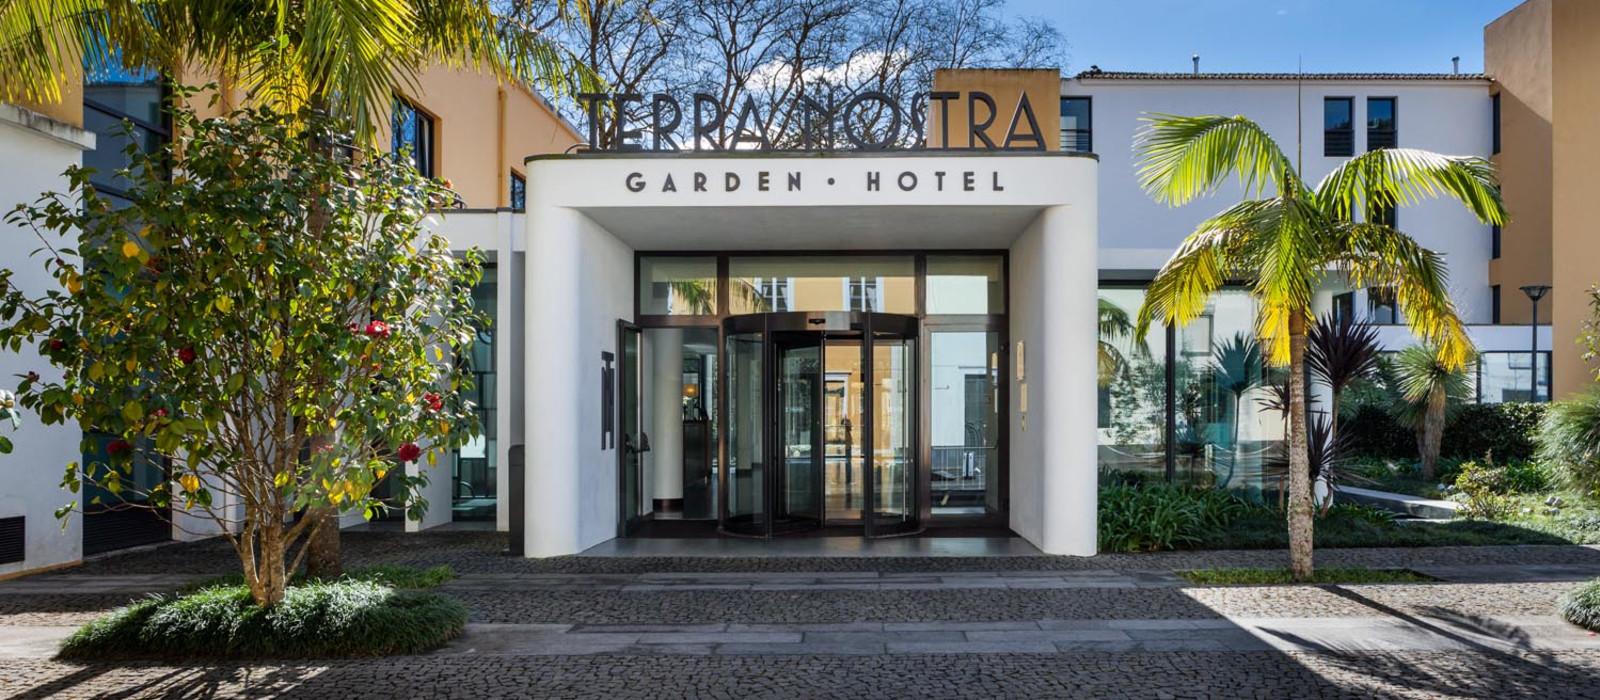 Hotel Terra Nostra Garden  Portugal